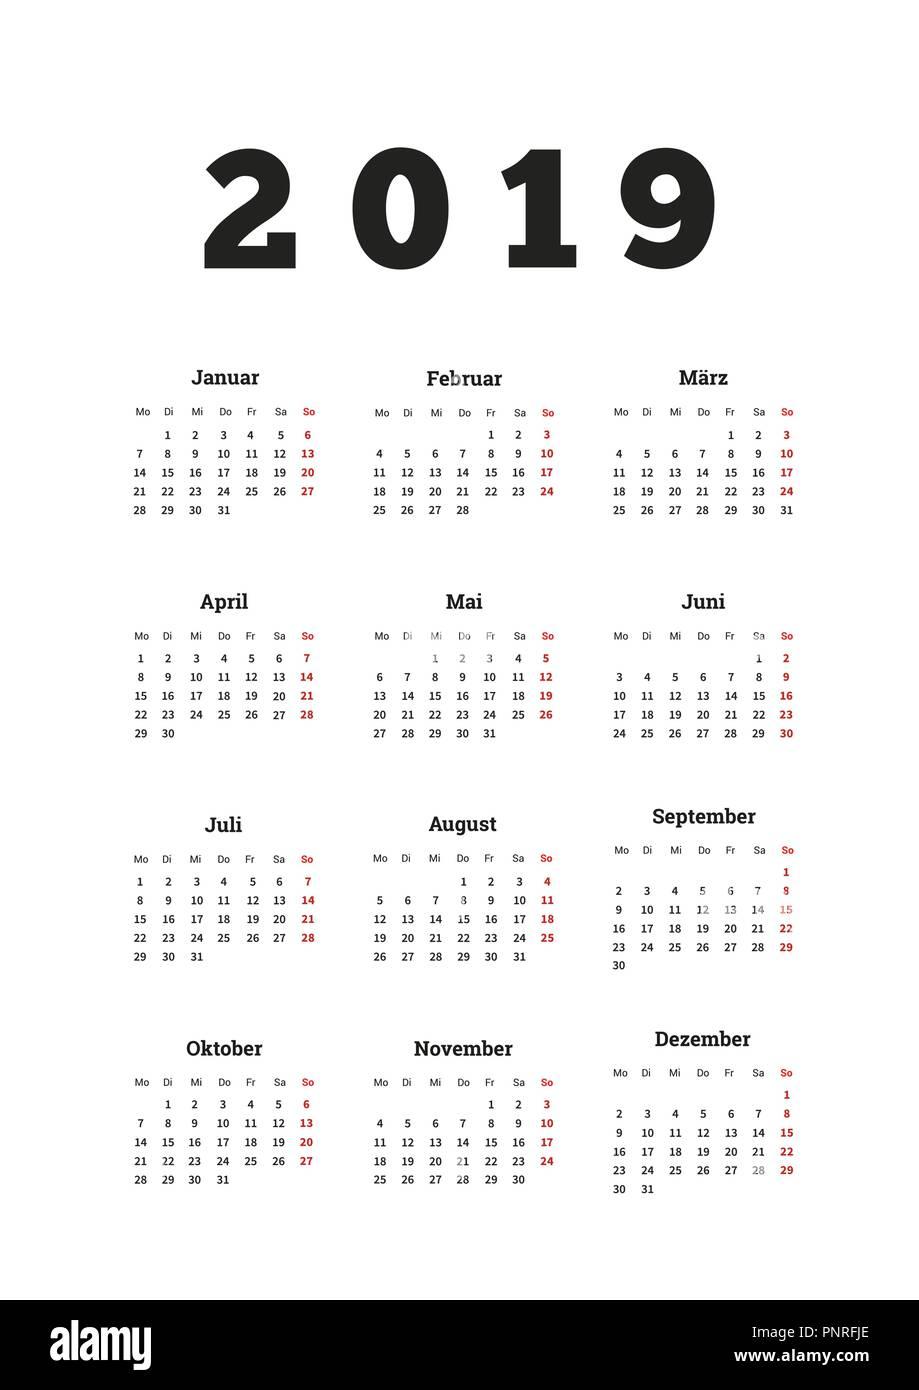 Kalender 2019 2